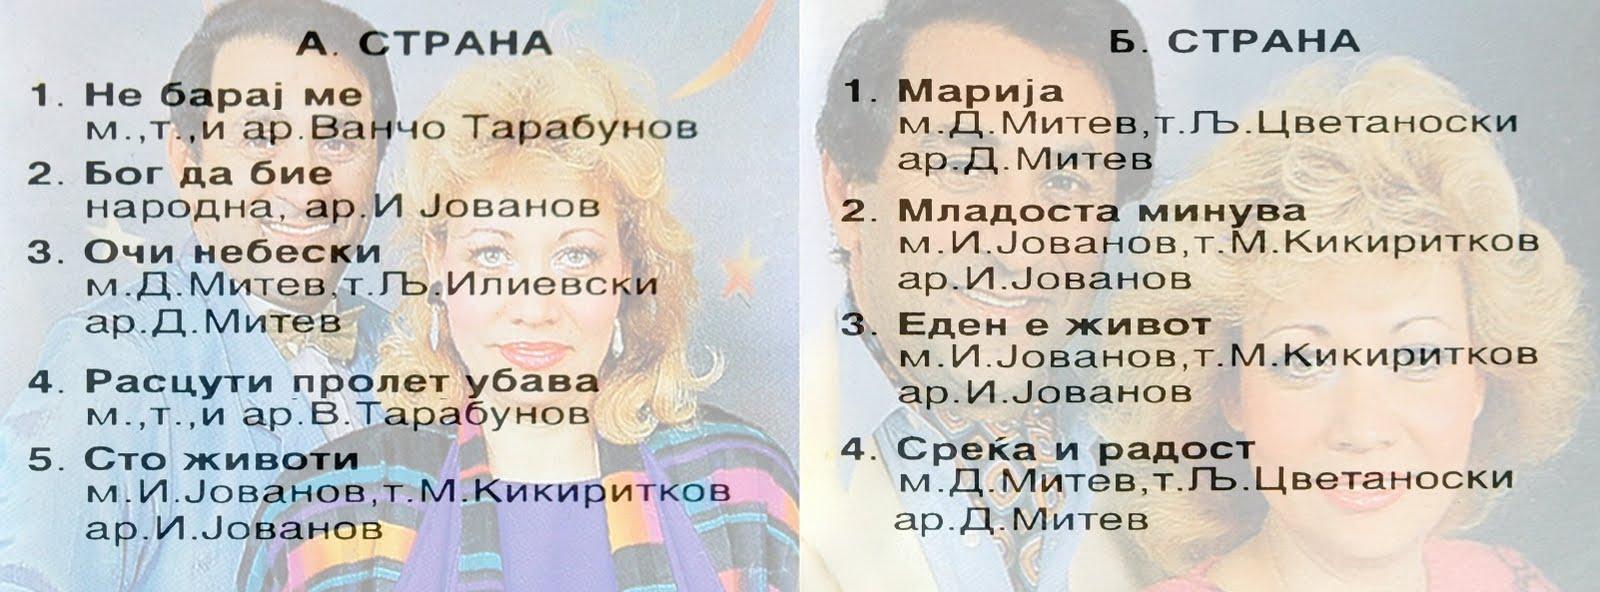 Duet Selimova - Želčeski* Селимова - Желчески - Љуби Ме, Љуби Ме